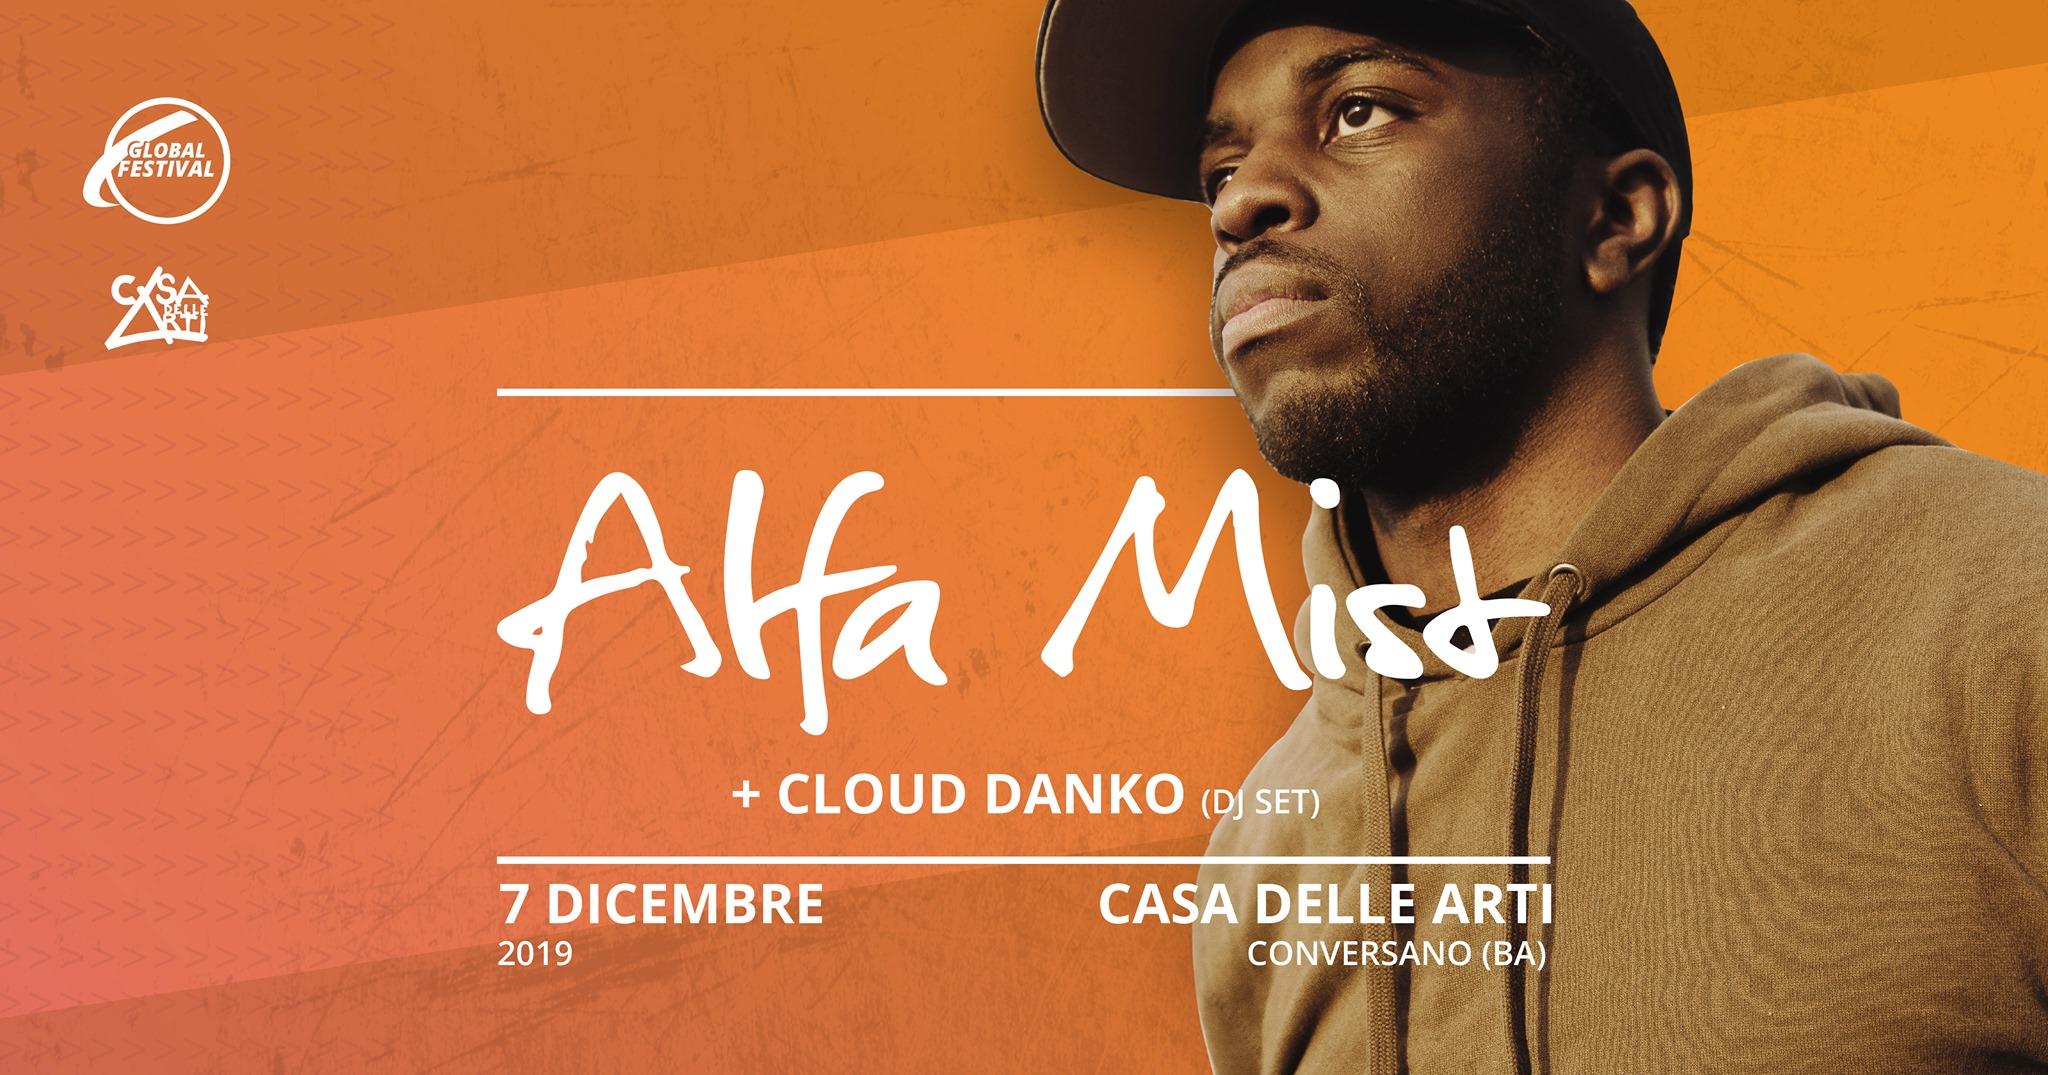 Alfa Mist + Cloud Danko dj set